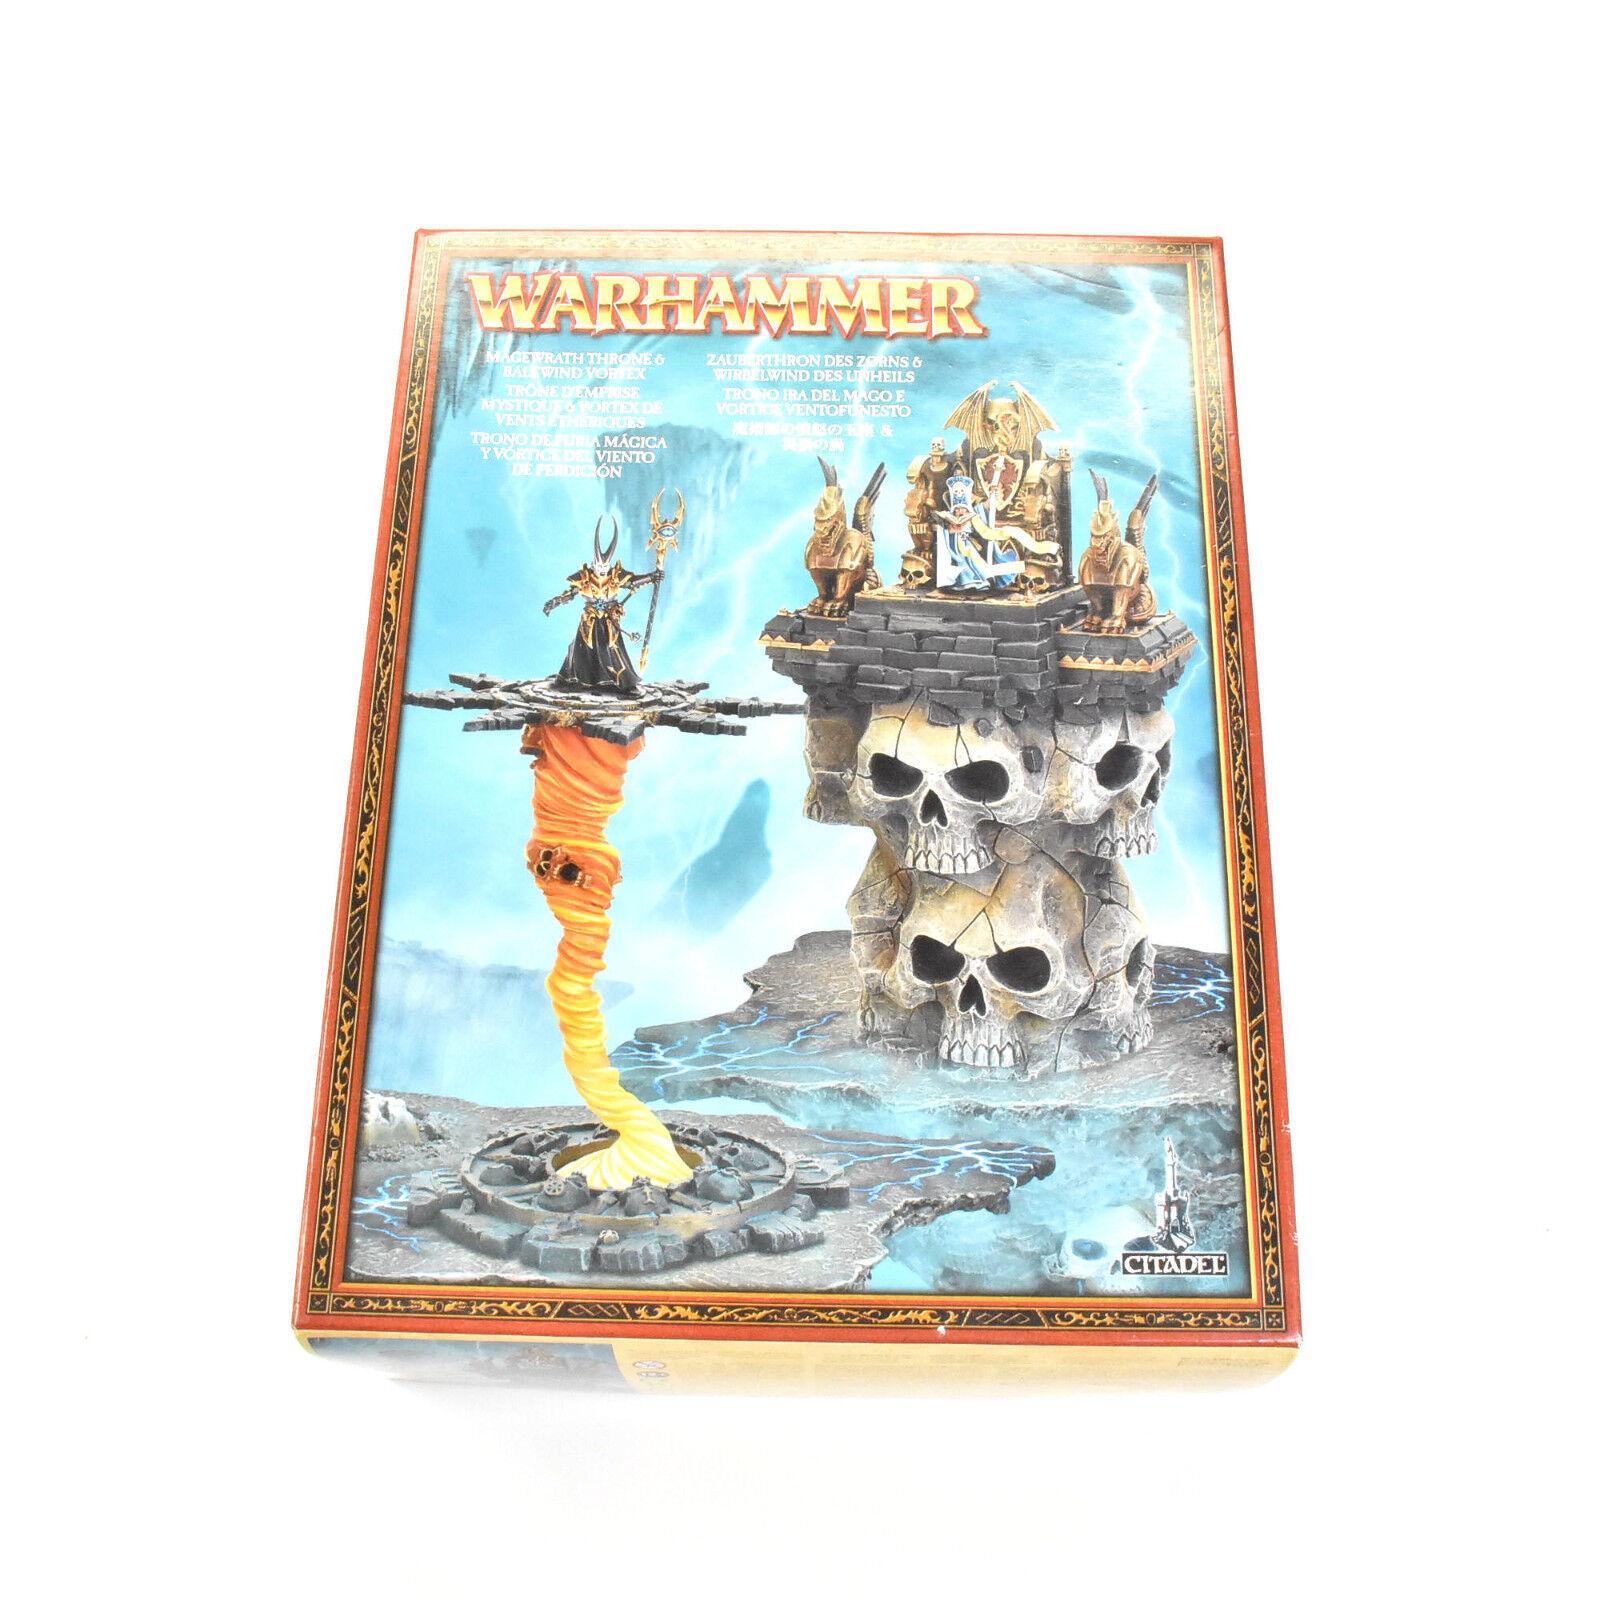 WARHAMMER FANTASY Storm of Magic Magewrath throne & balewind vortex scenery